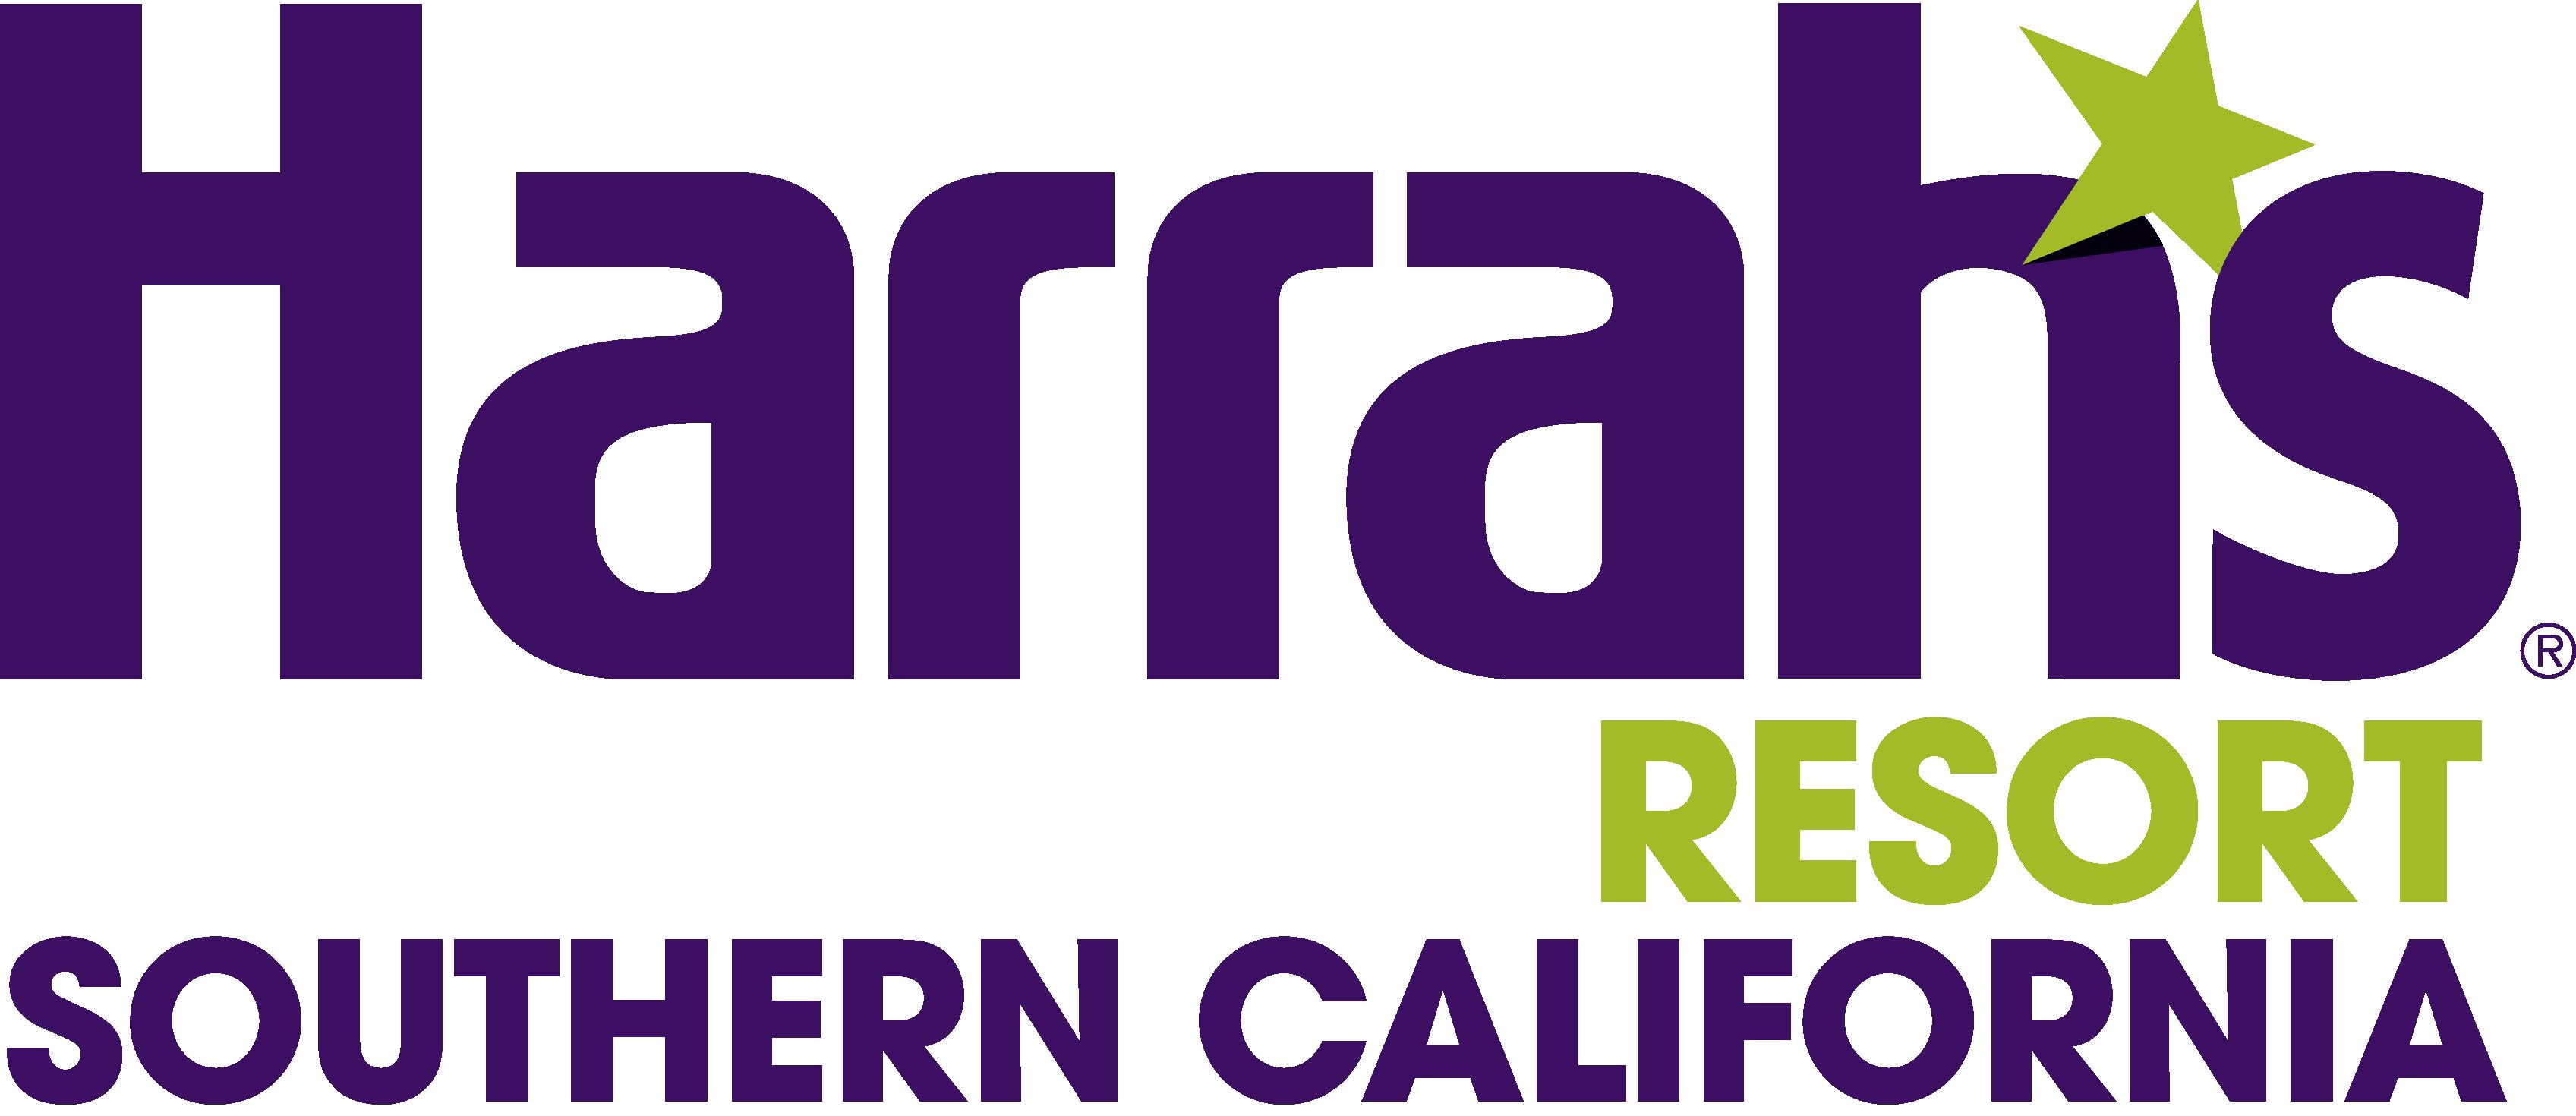 fileharrahs resort southern california casino logopng